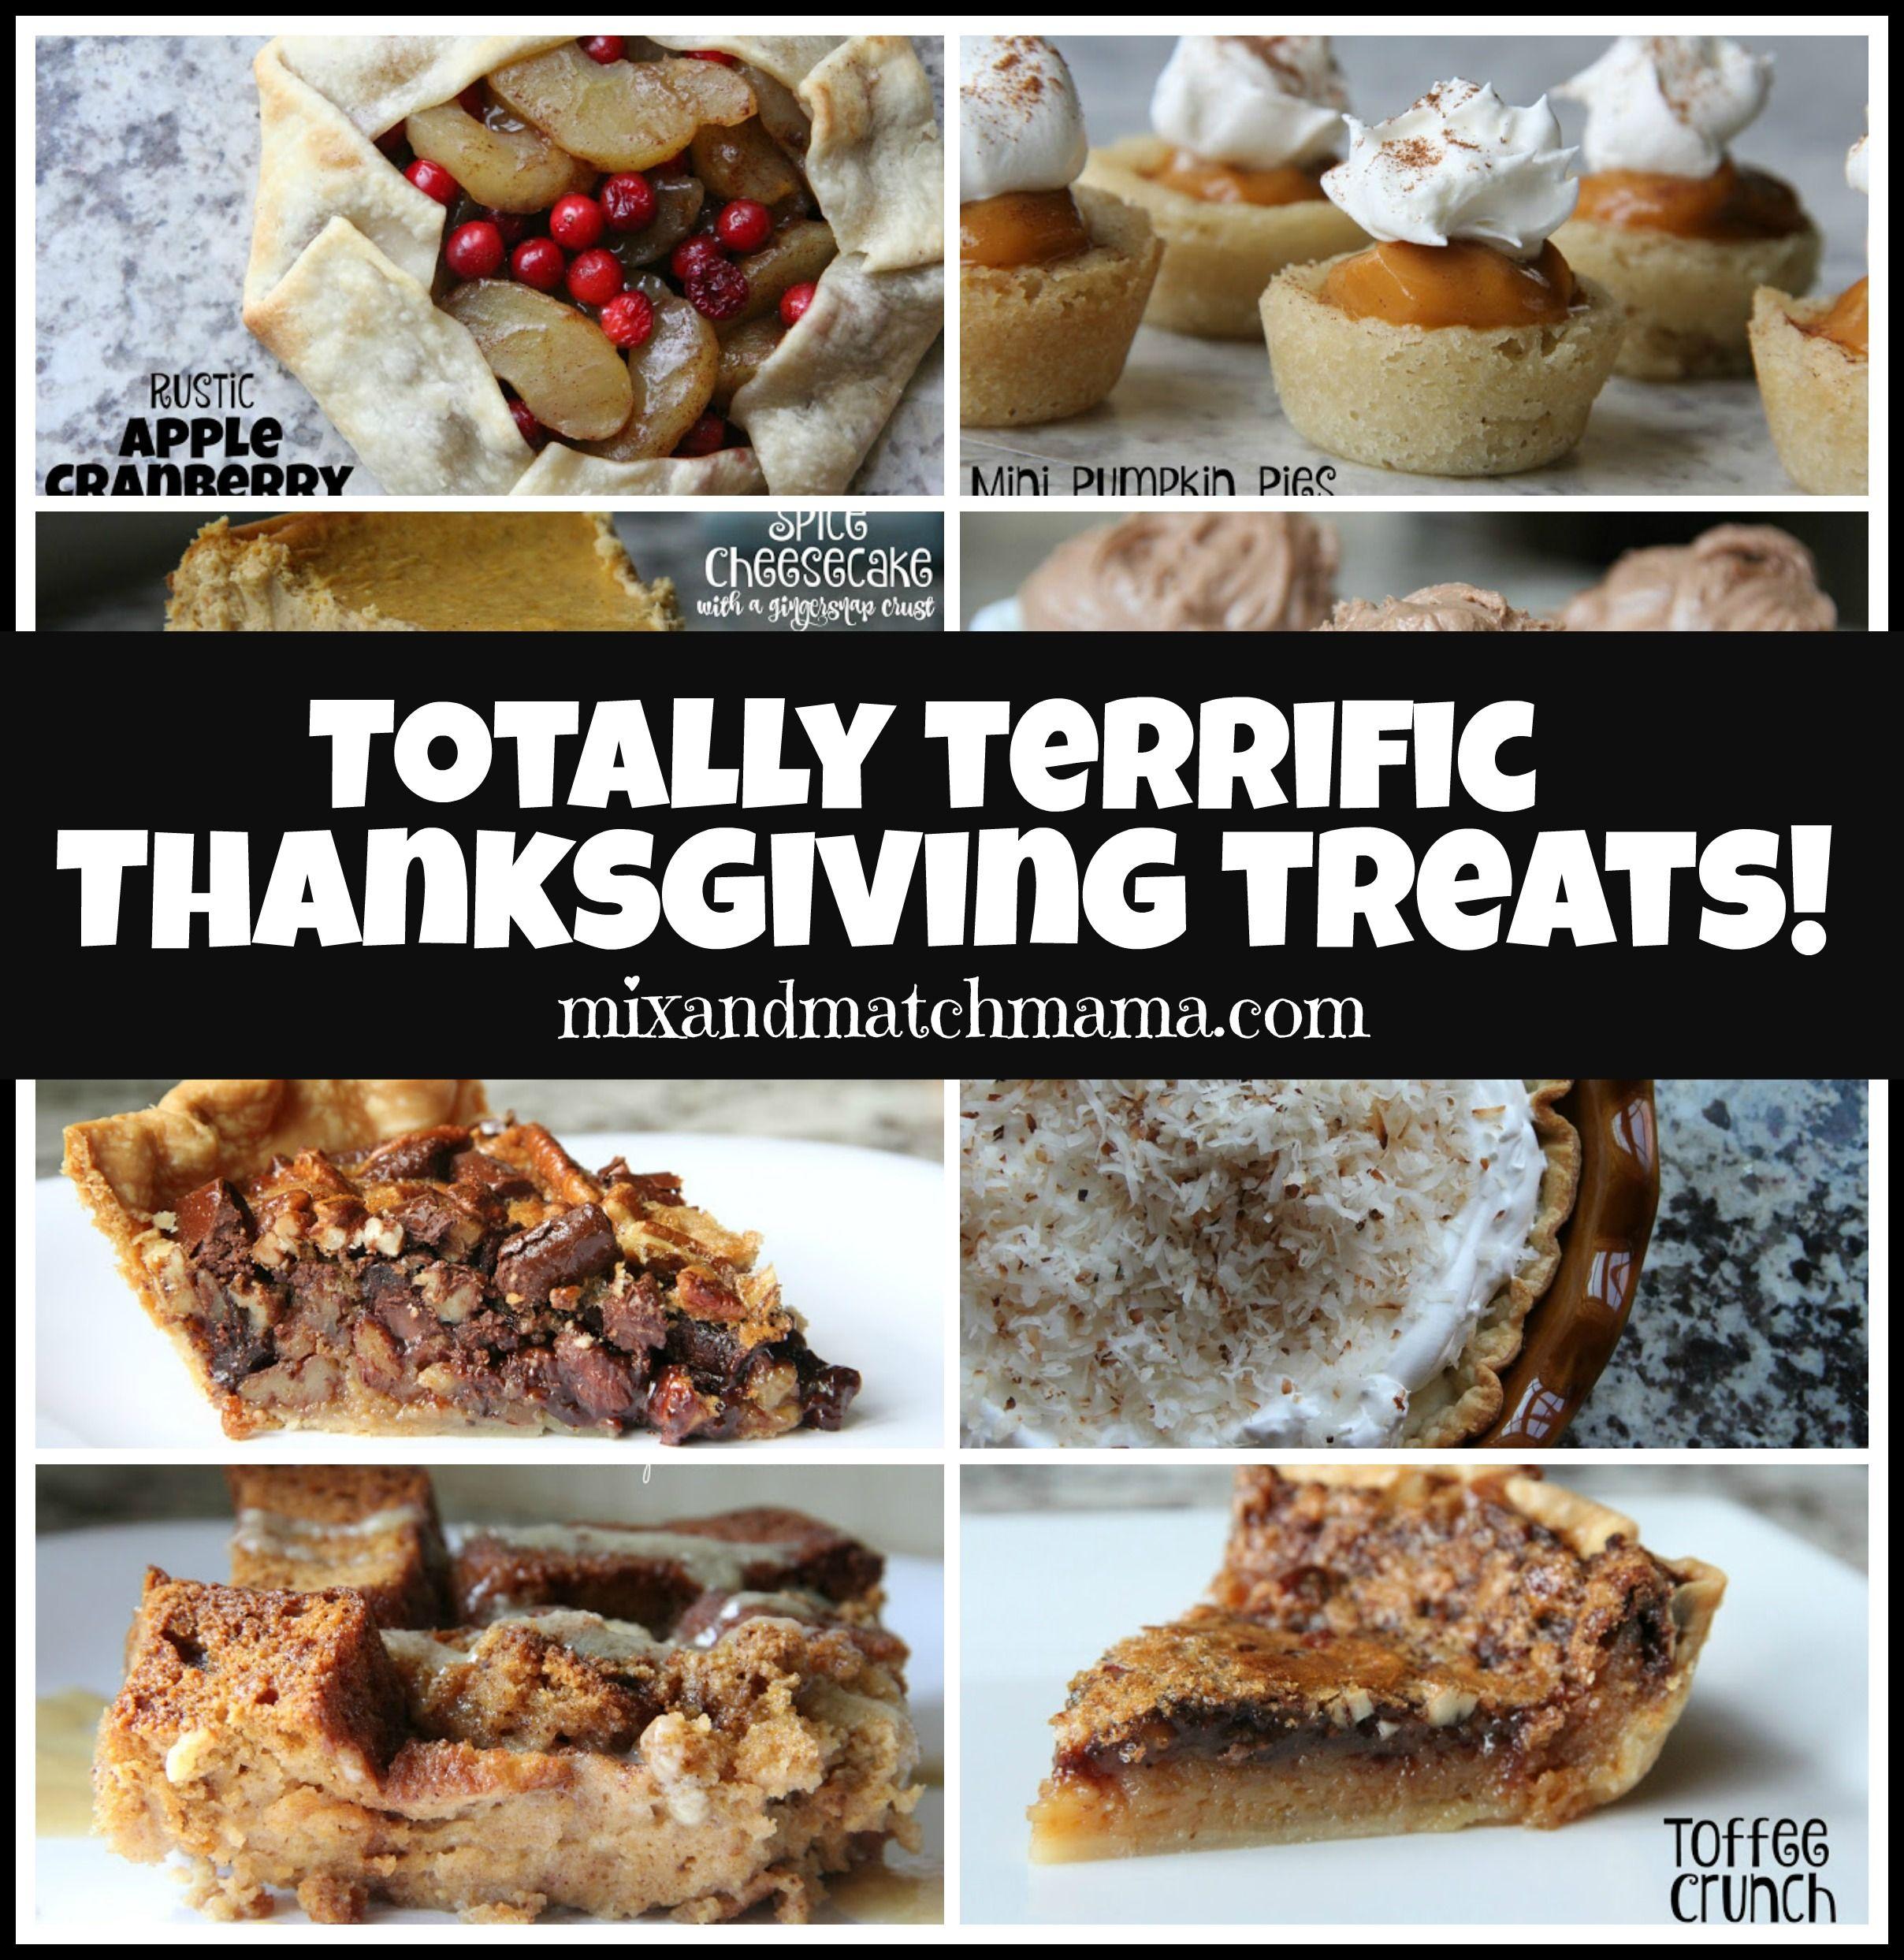 Totally Terrific Thanksgiving Treats Recipe